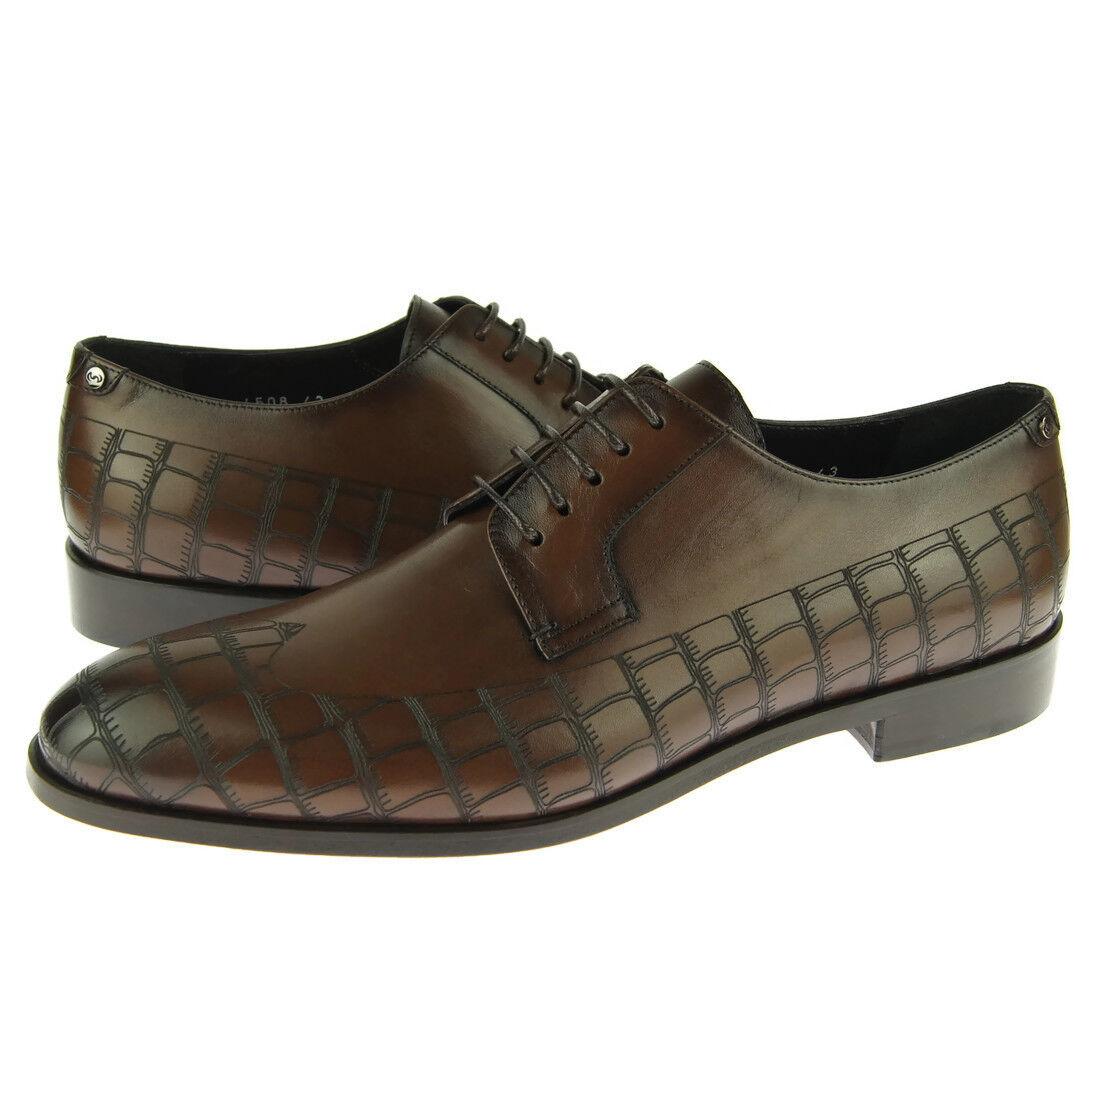 Corrente 4508 Crocodile Print Derby, Men's Lace-up Oxford scarpe, Marroneee